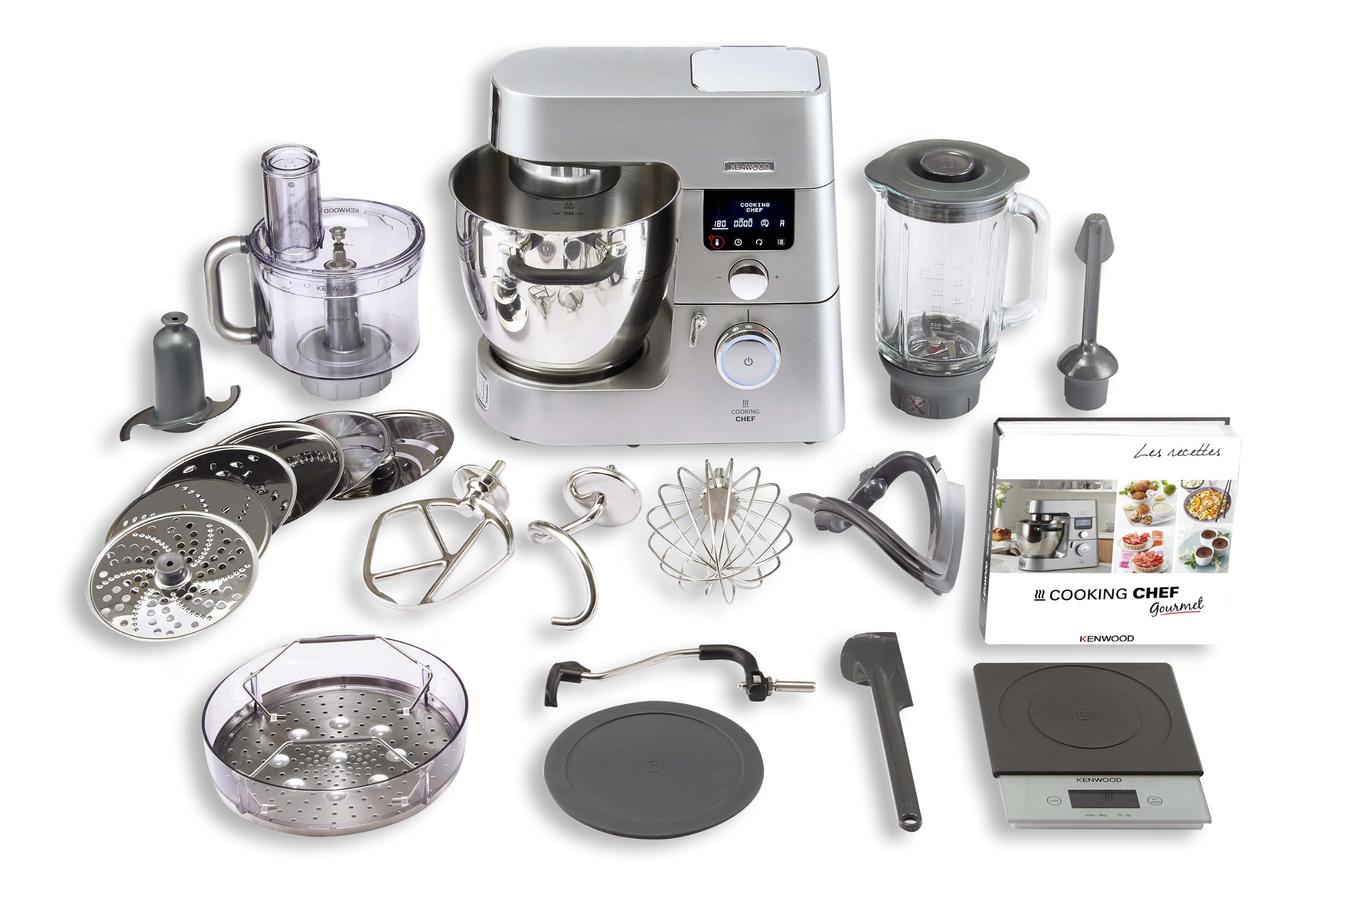 robot cuiseur kenwood cooking chef gourmet kcc9063s darty. Black Bedroom Furniture Sets. Home Design Ideas